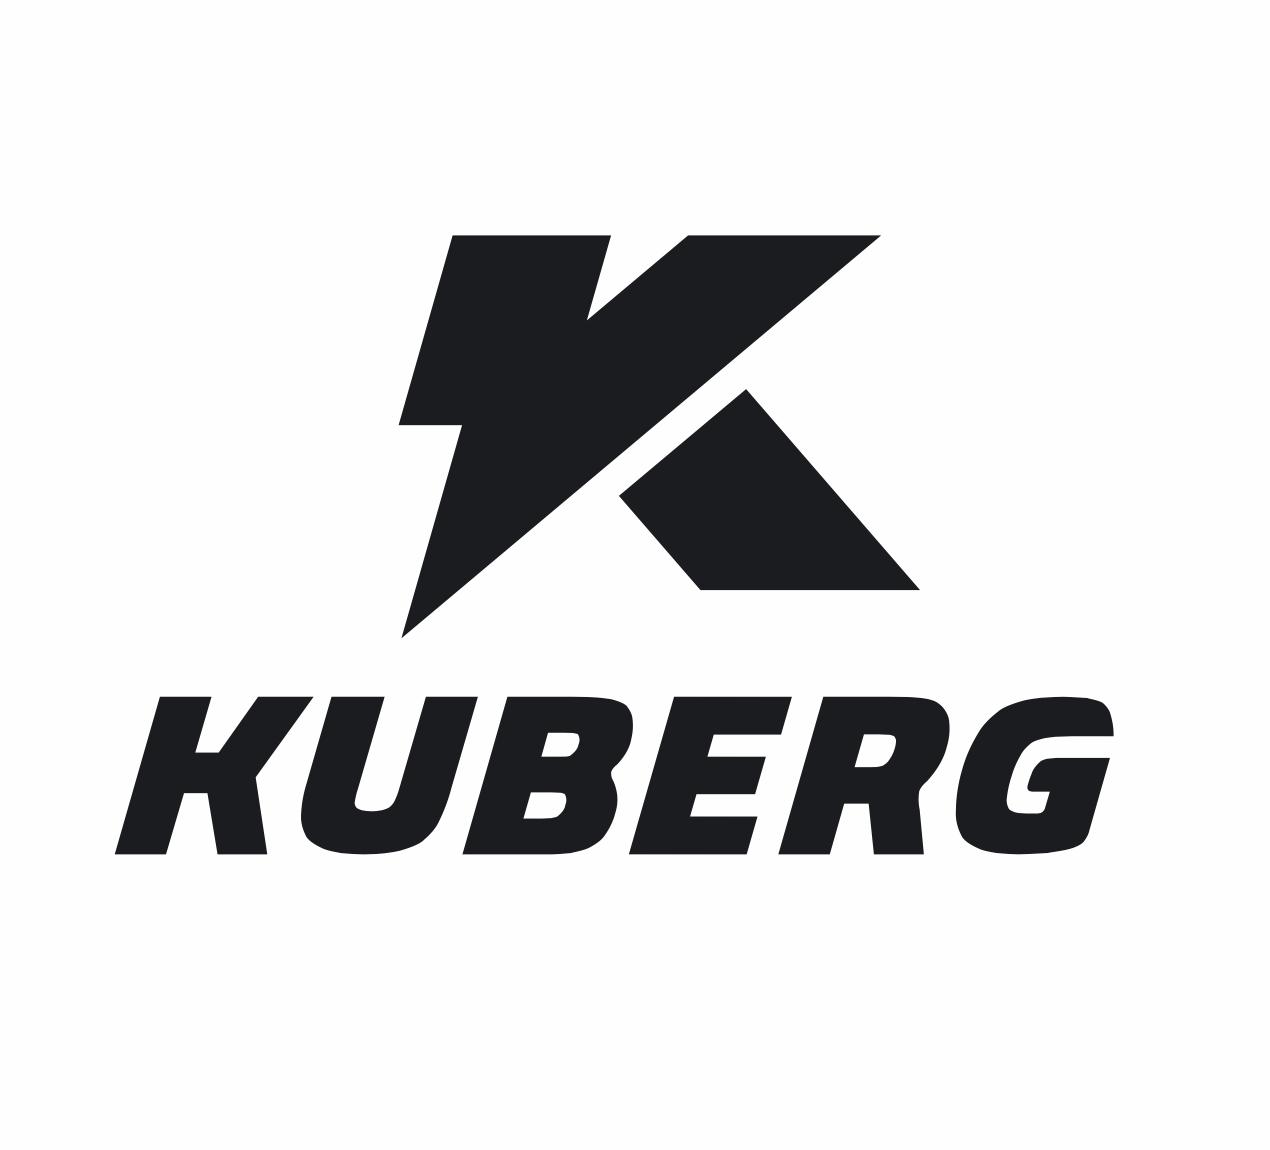 Kuberg-logo-zoom.png